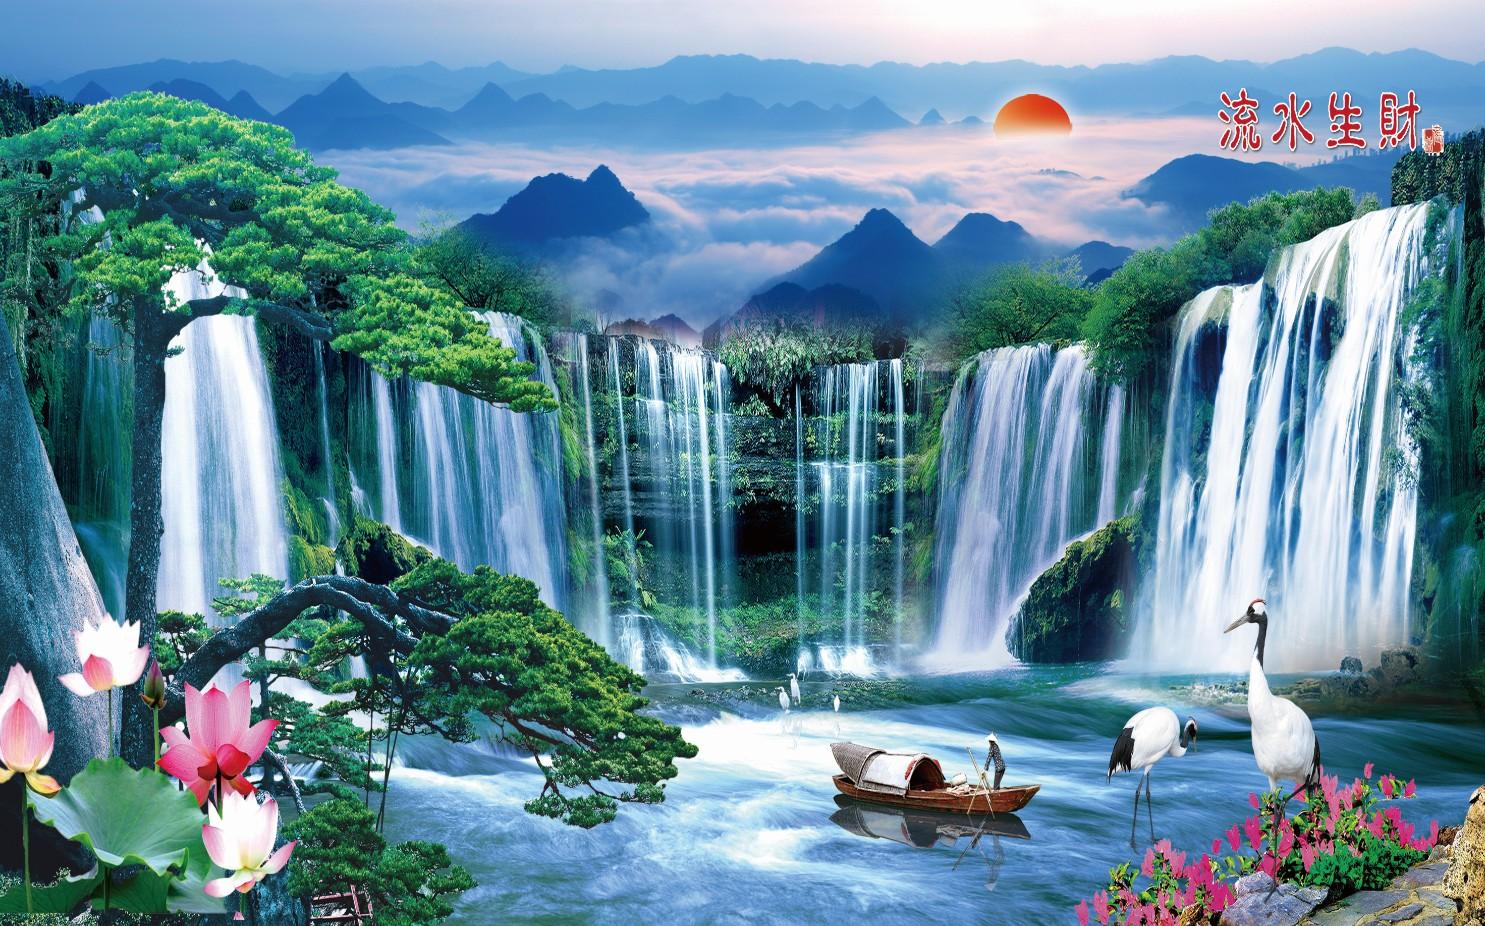 xt90147中式山水瀑布仙鹤太阳松树荷花金鱼渔船鲜花